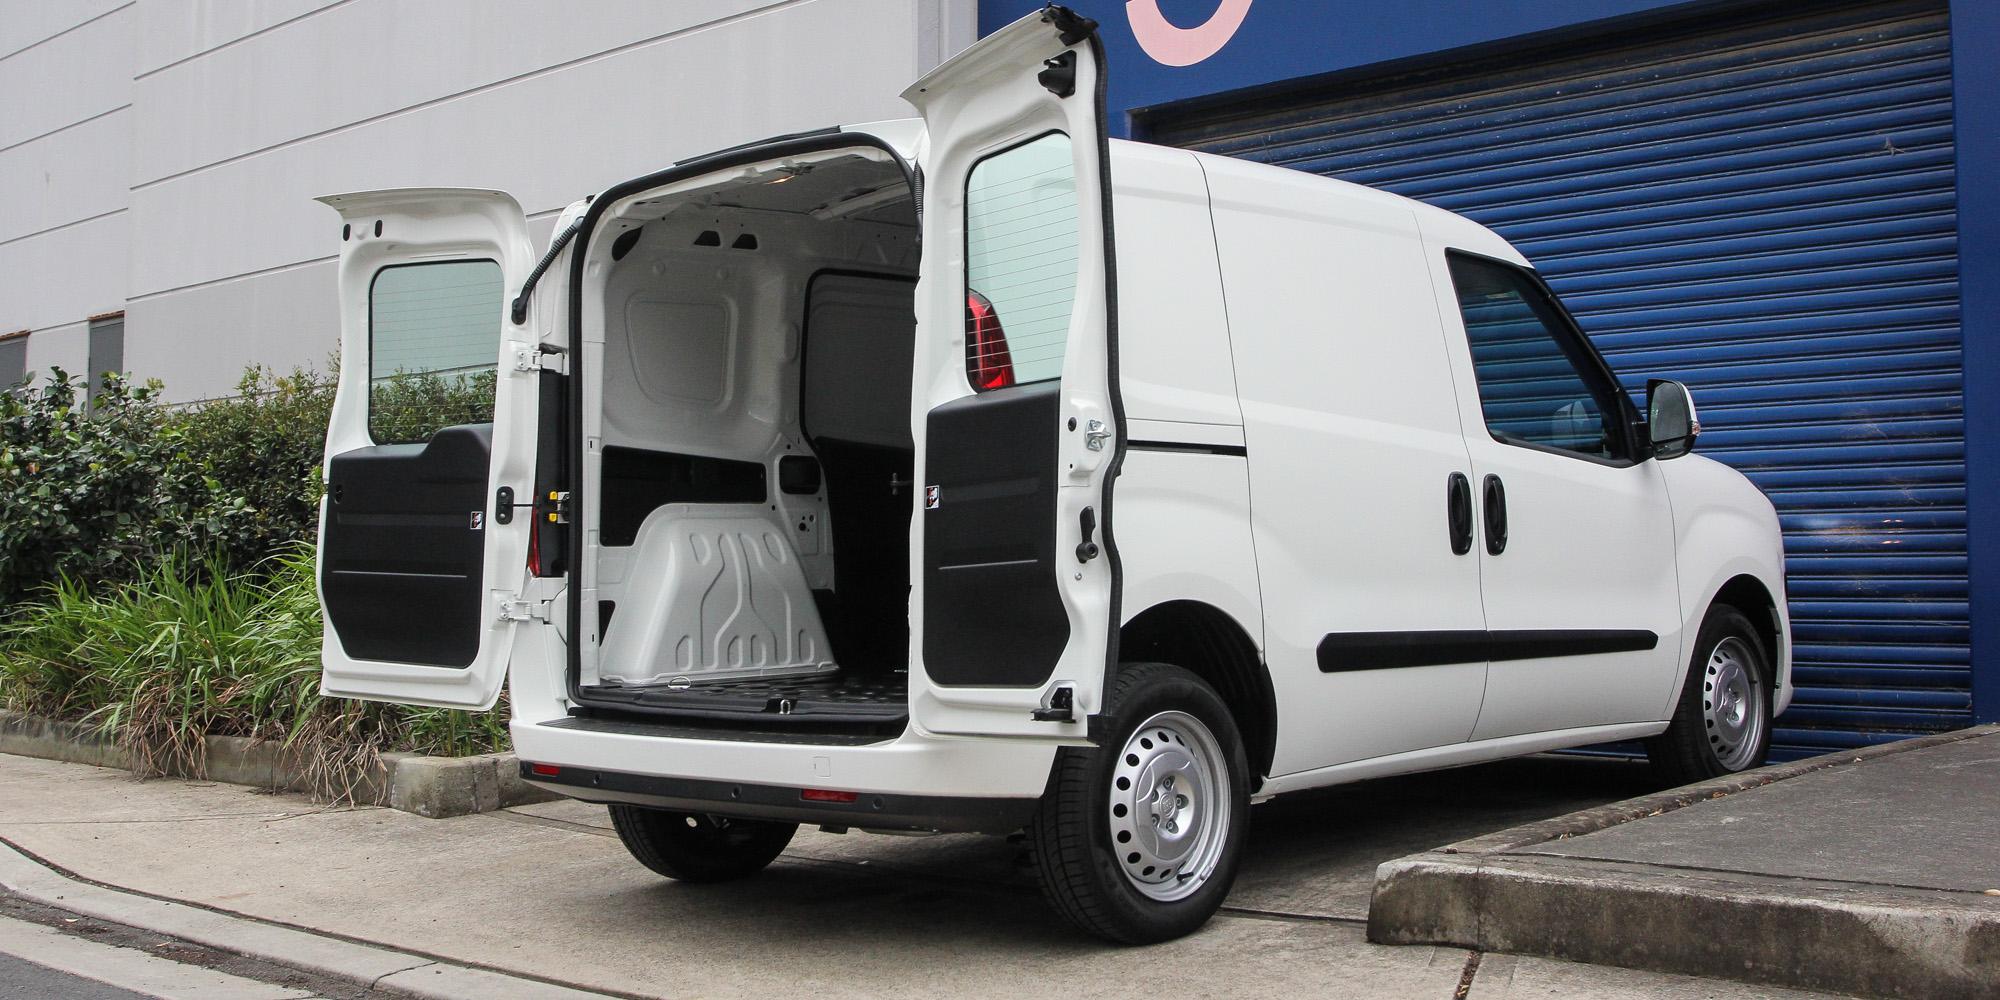 Fiat Doblo V Citroen Berlingo Small Van Comparison Test